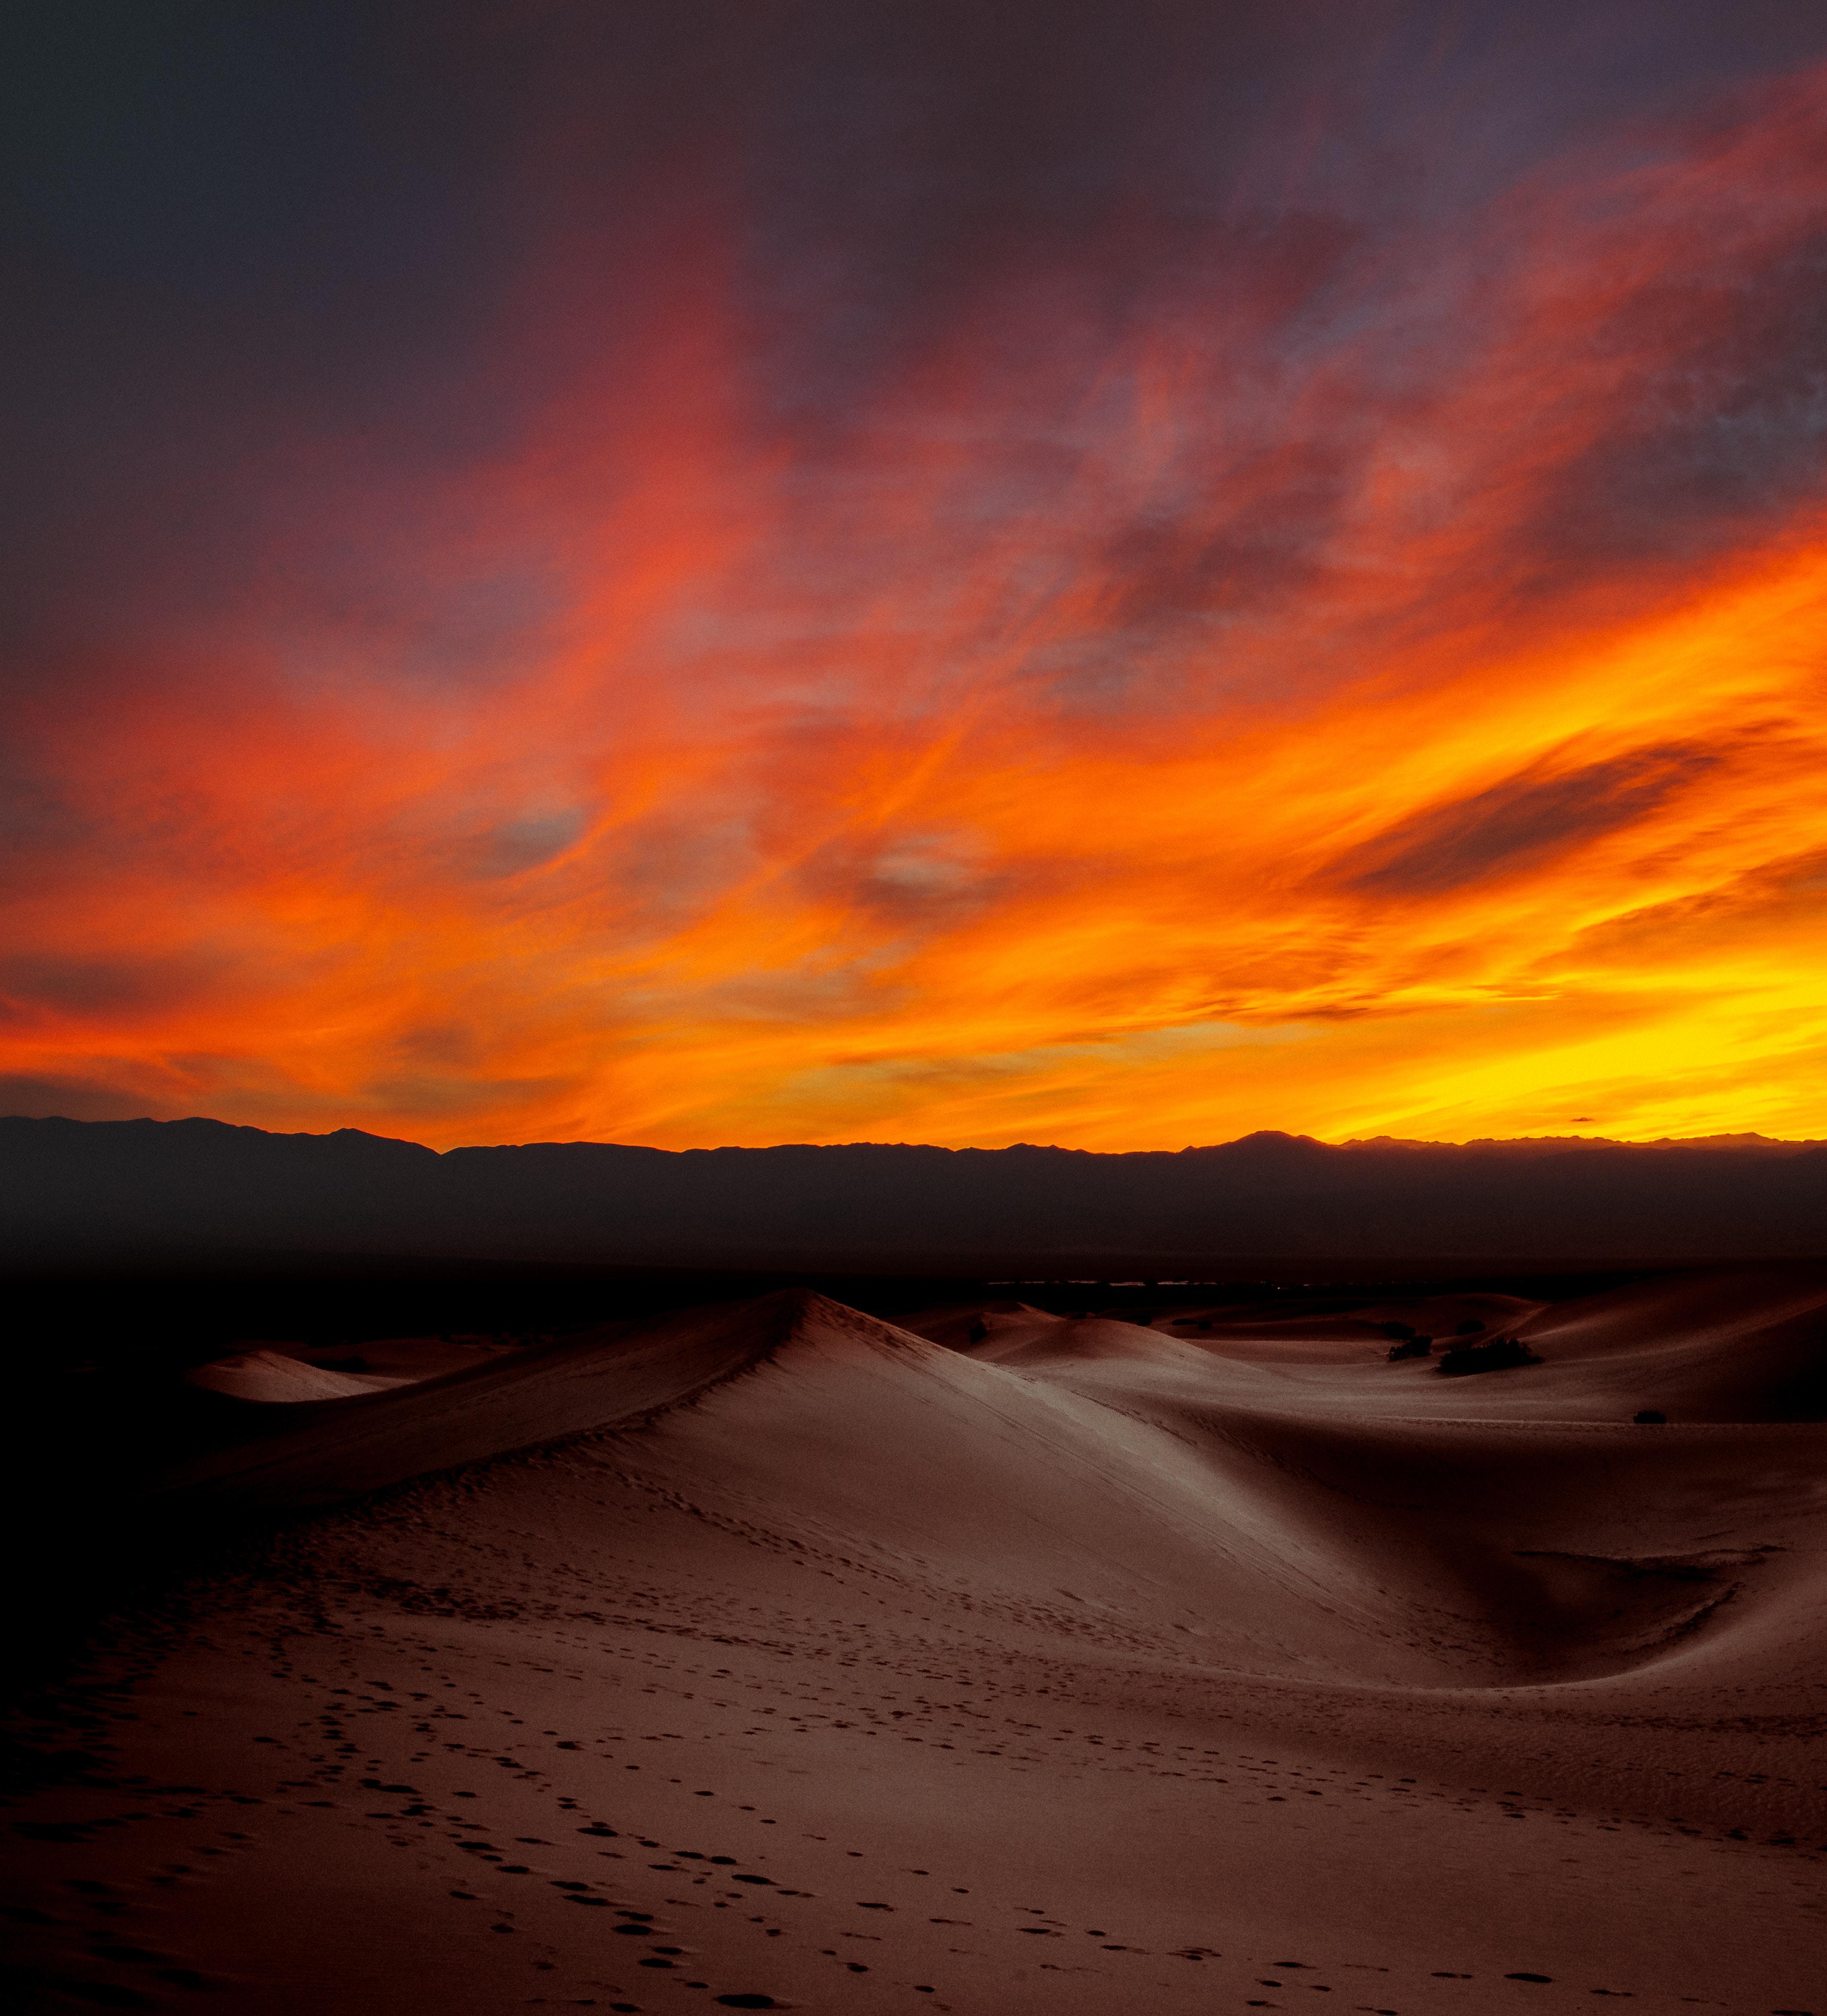 Smartphone Wallpaper 4k Nature: Burning Sunset Dark Desert 4k, HD Nature, 4k Wallpapers